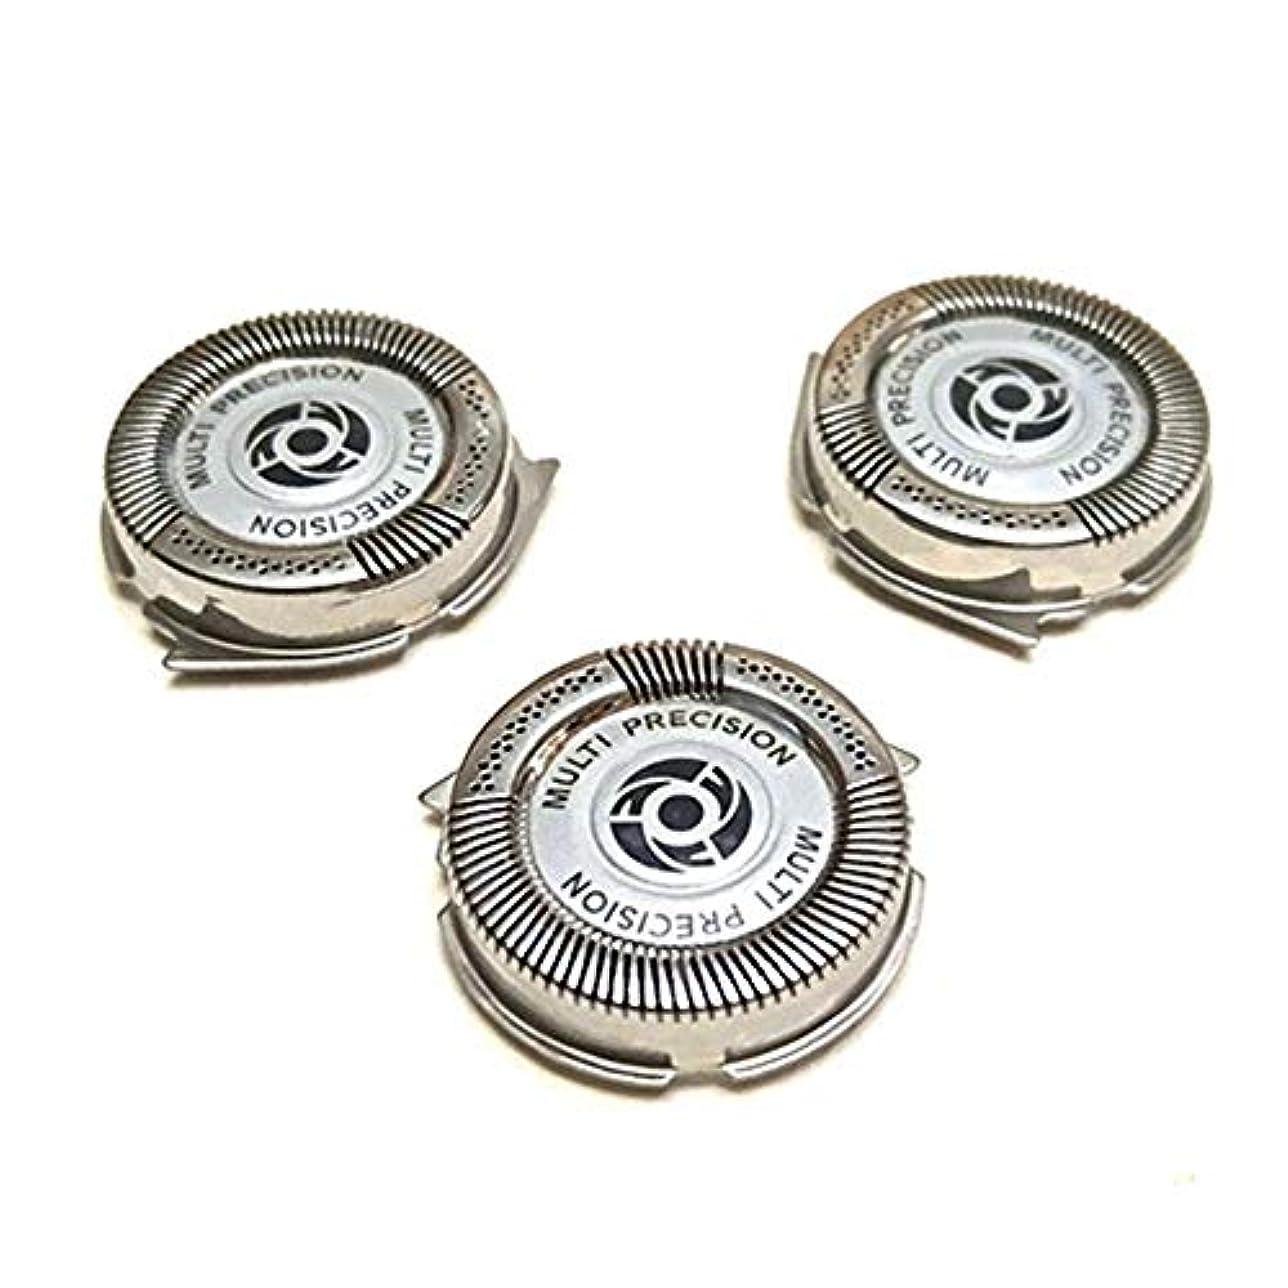 3PCSシェーバー 替刃 交換用カッターヘッド フィリップスカミソリSH50 S5091 S5080 S5076 S5420 5082シェービング アクセサリー